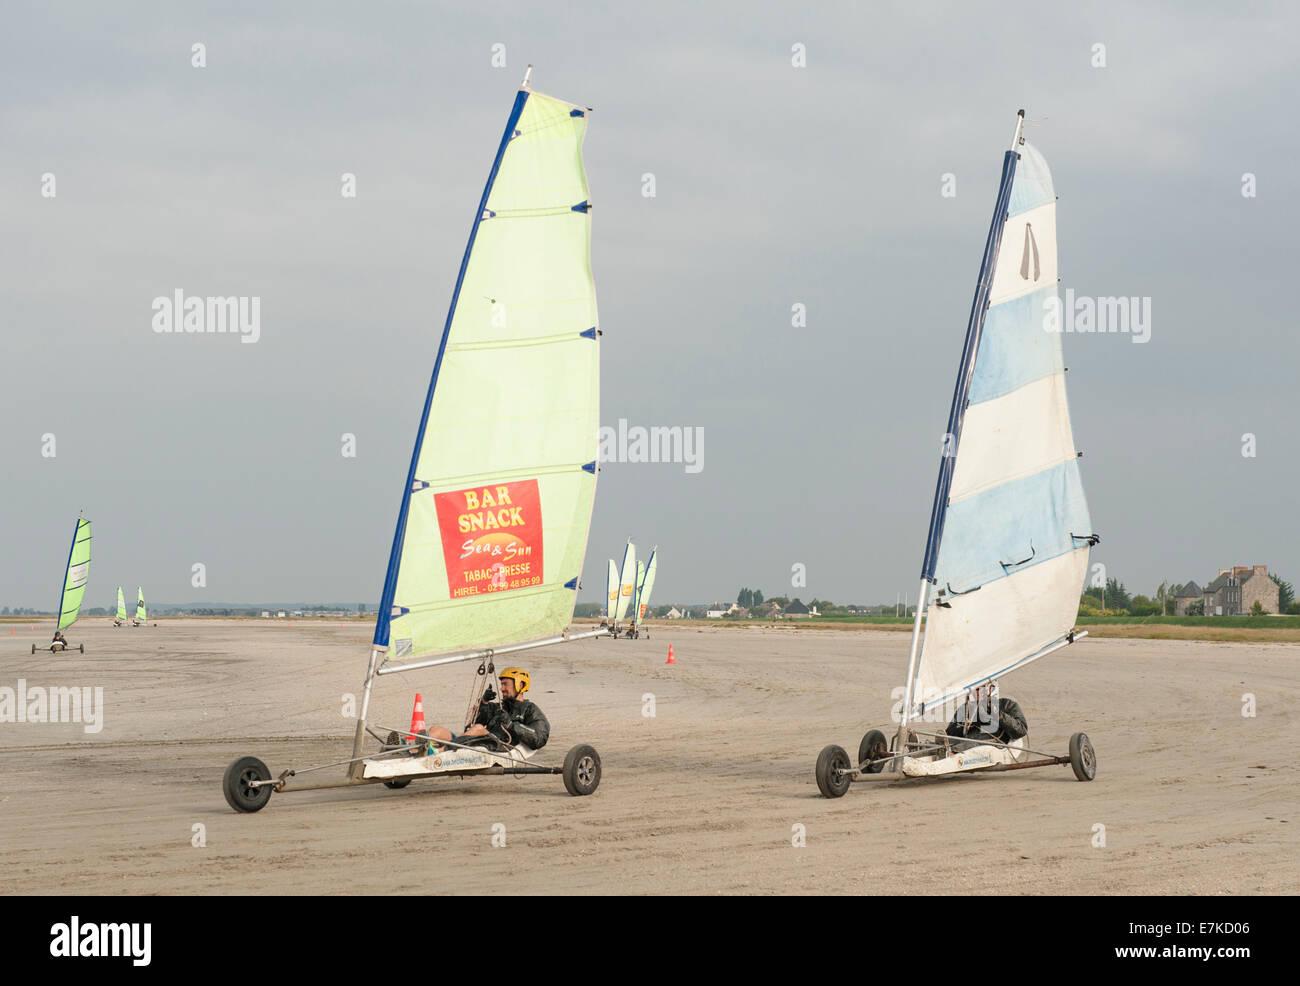 Char à voile, sand sailing, at Vivier-sur-Mer, Brittany, France - Stock Image